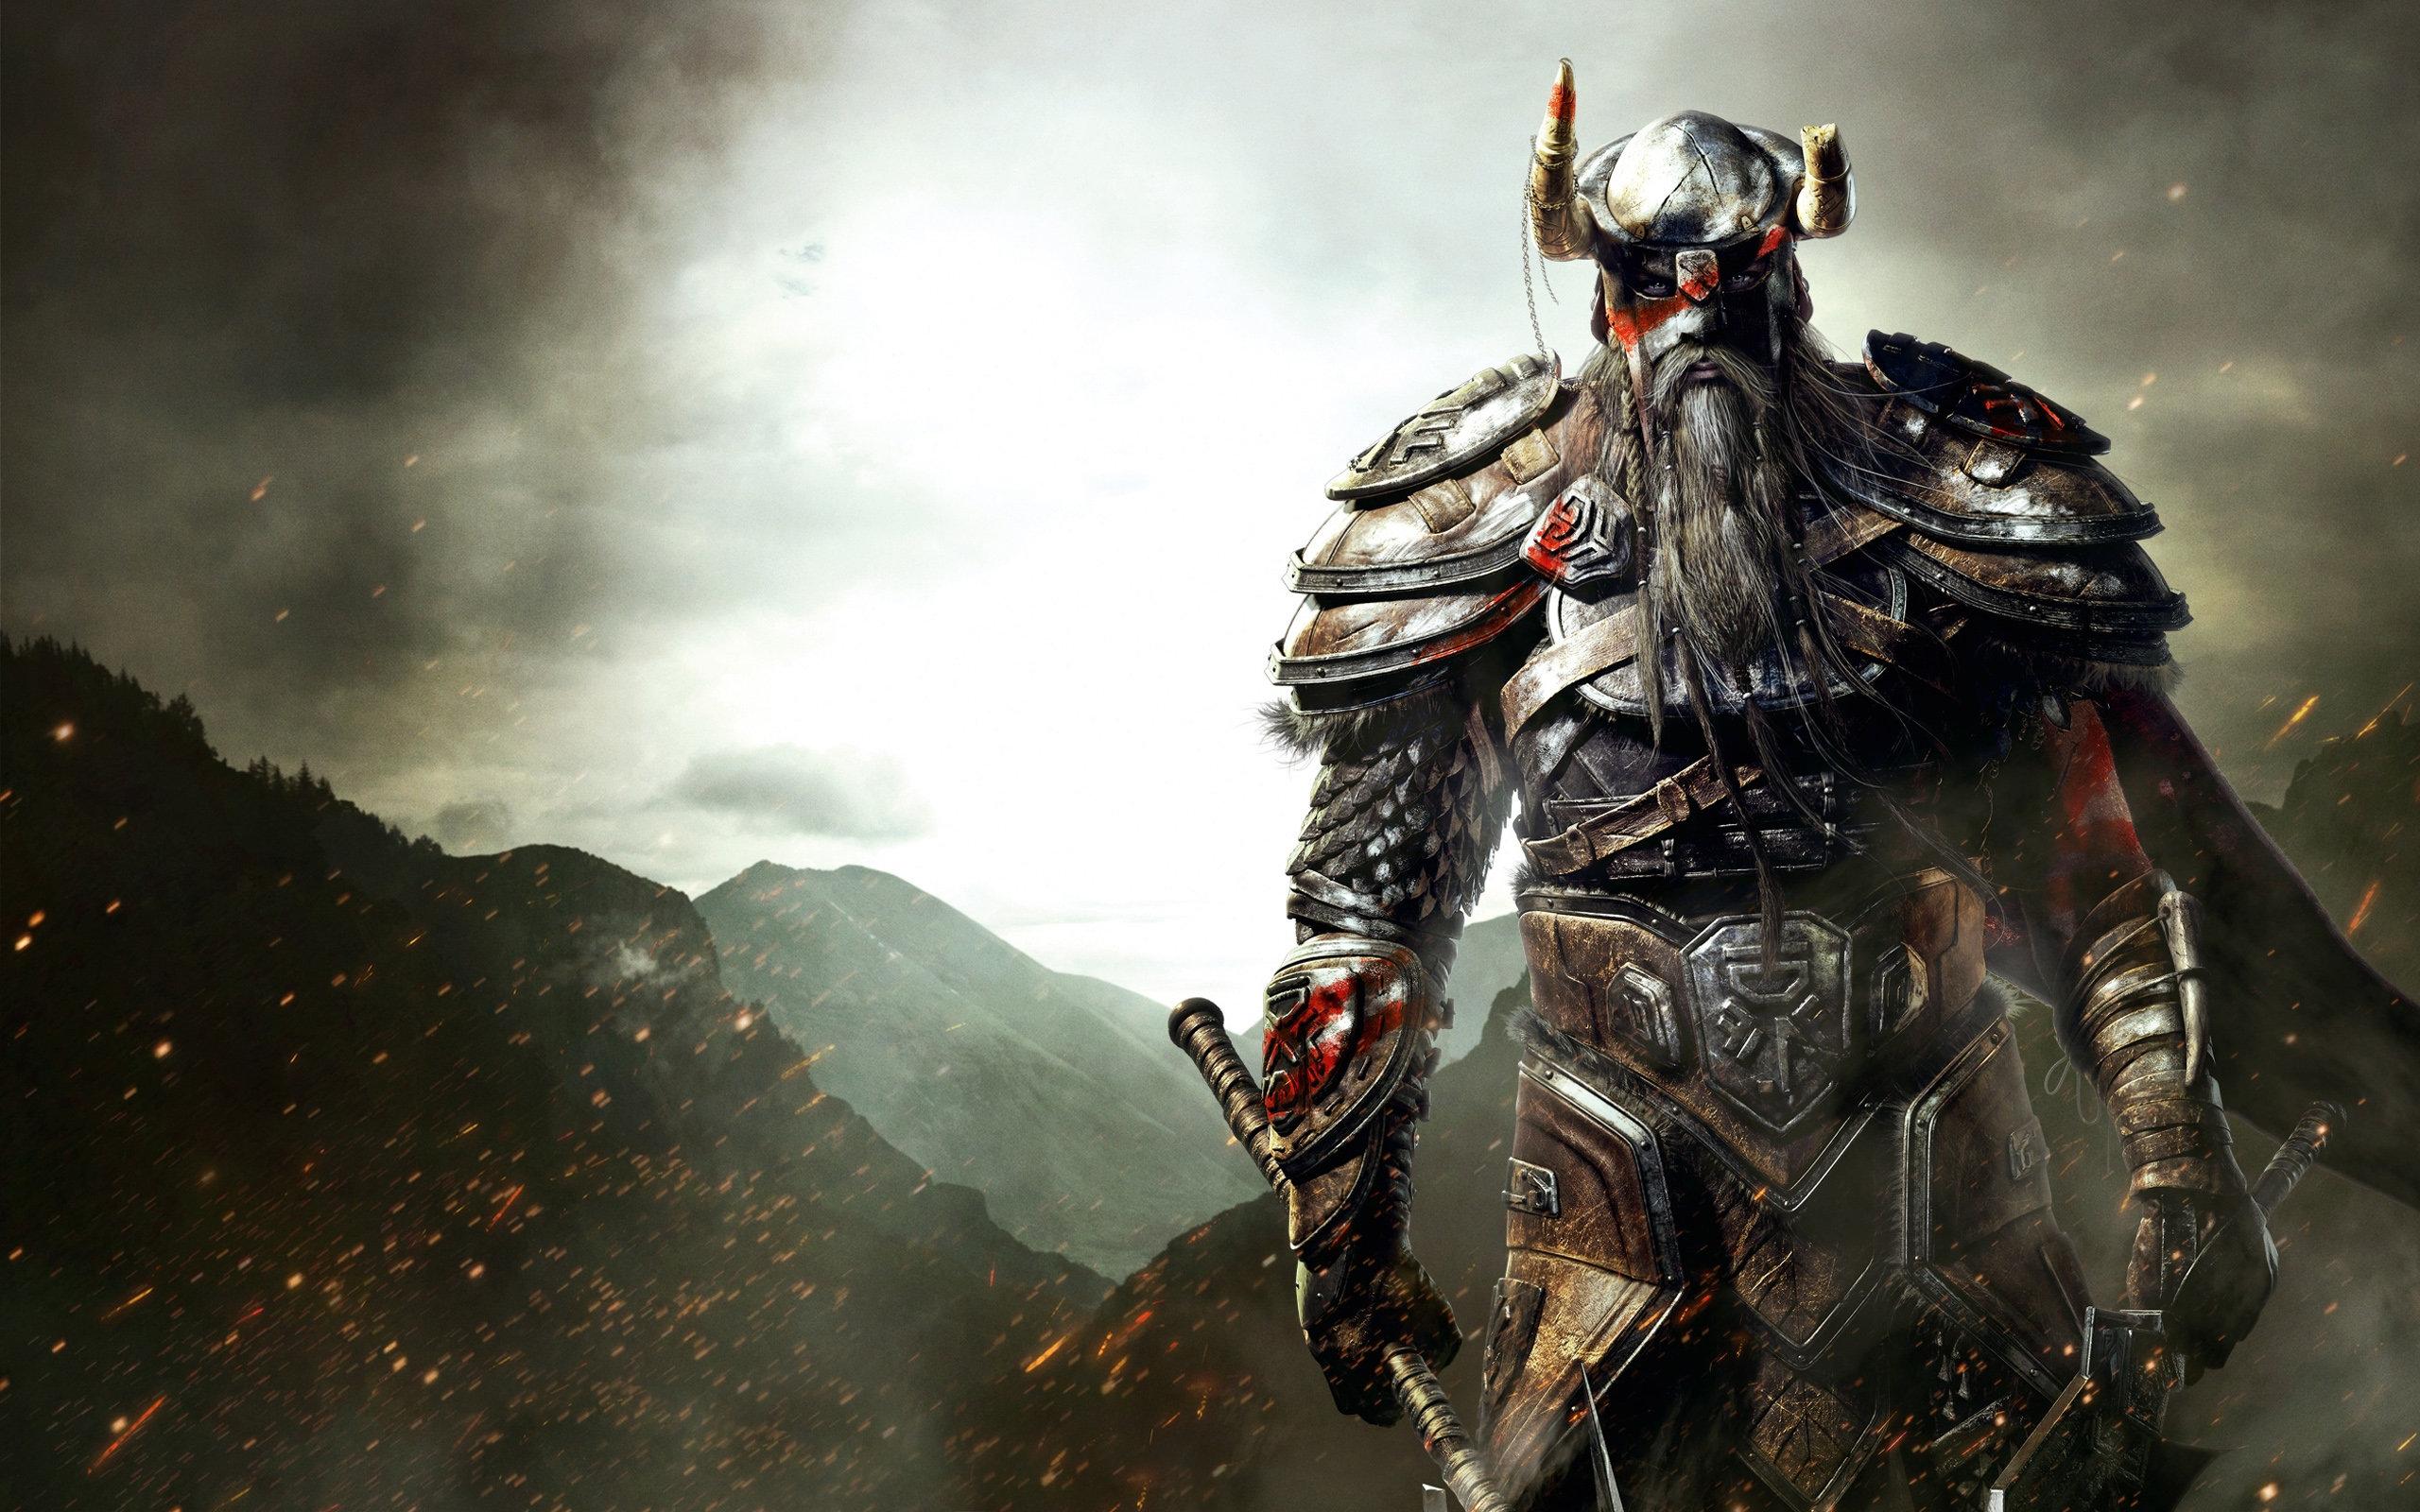 The Elder Scrolls Online Wallpapers Hd For Desktop Backgrounds